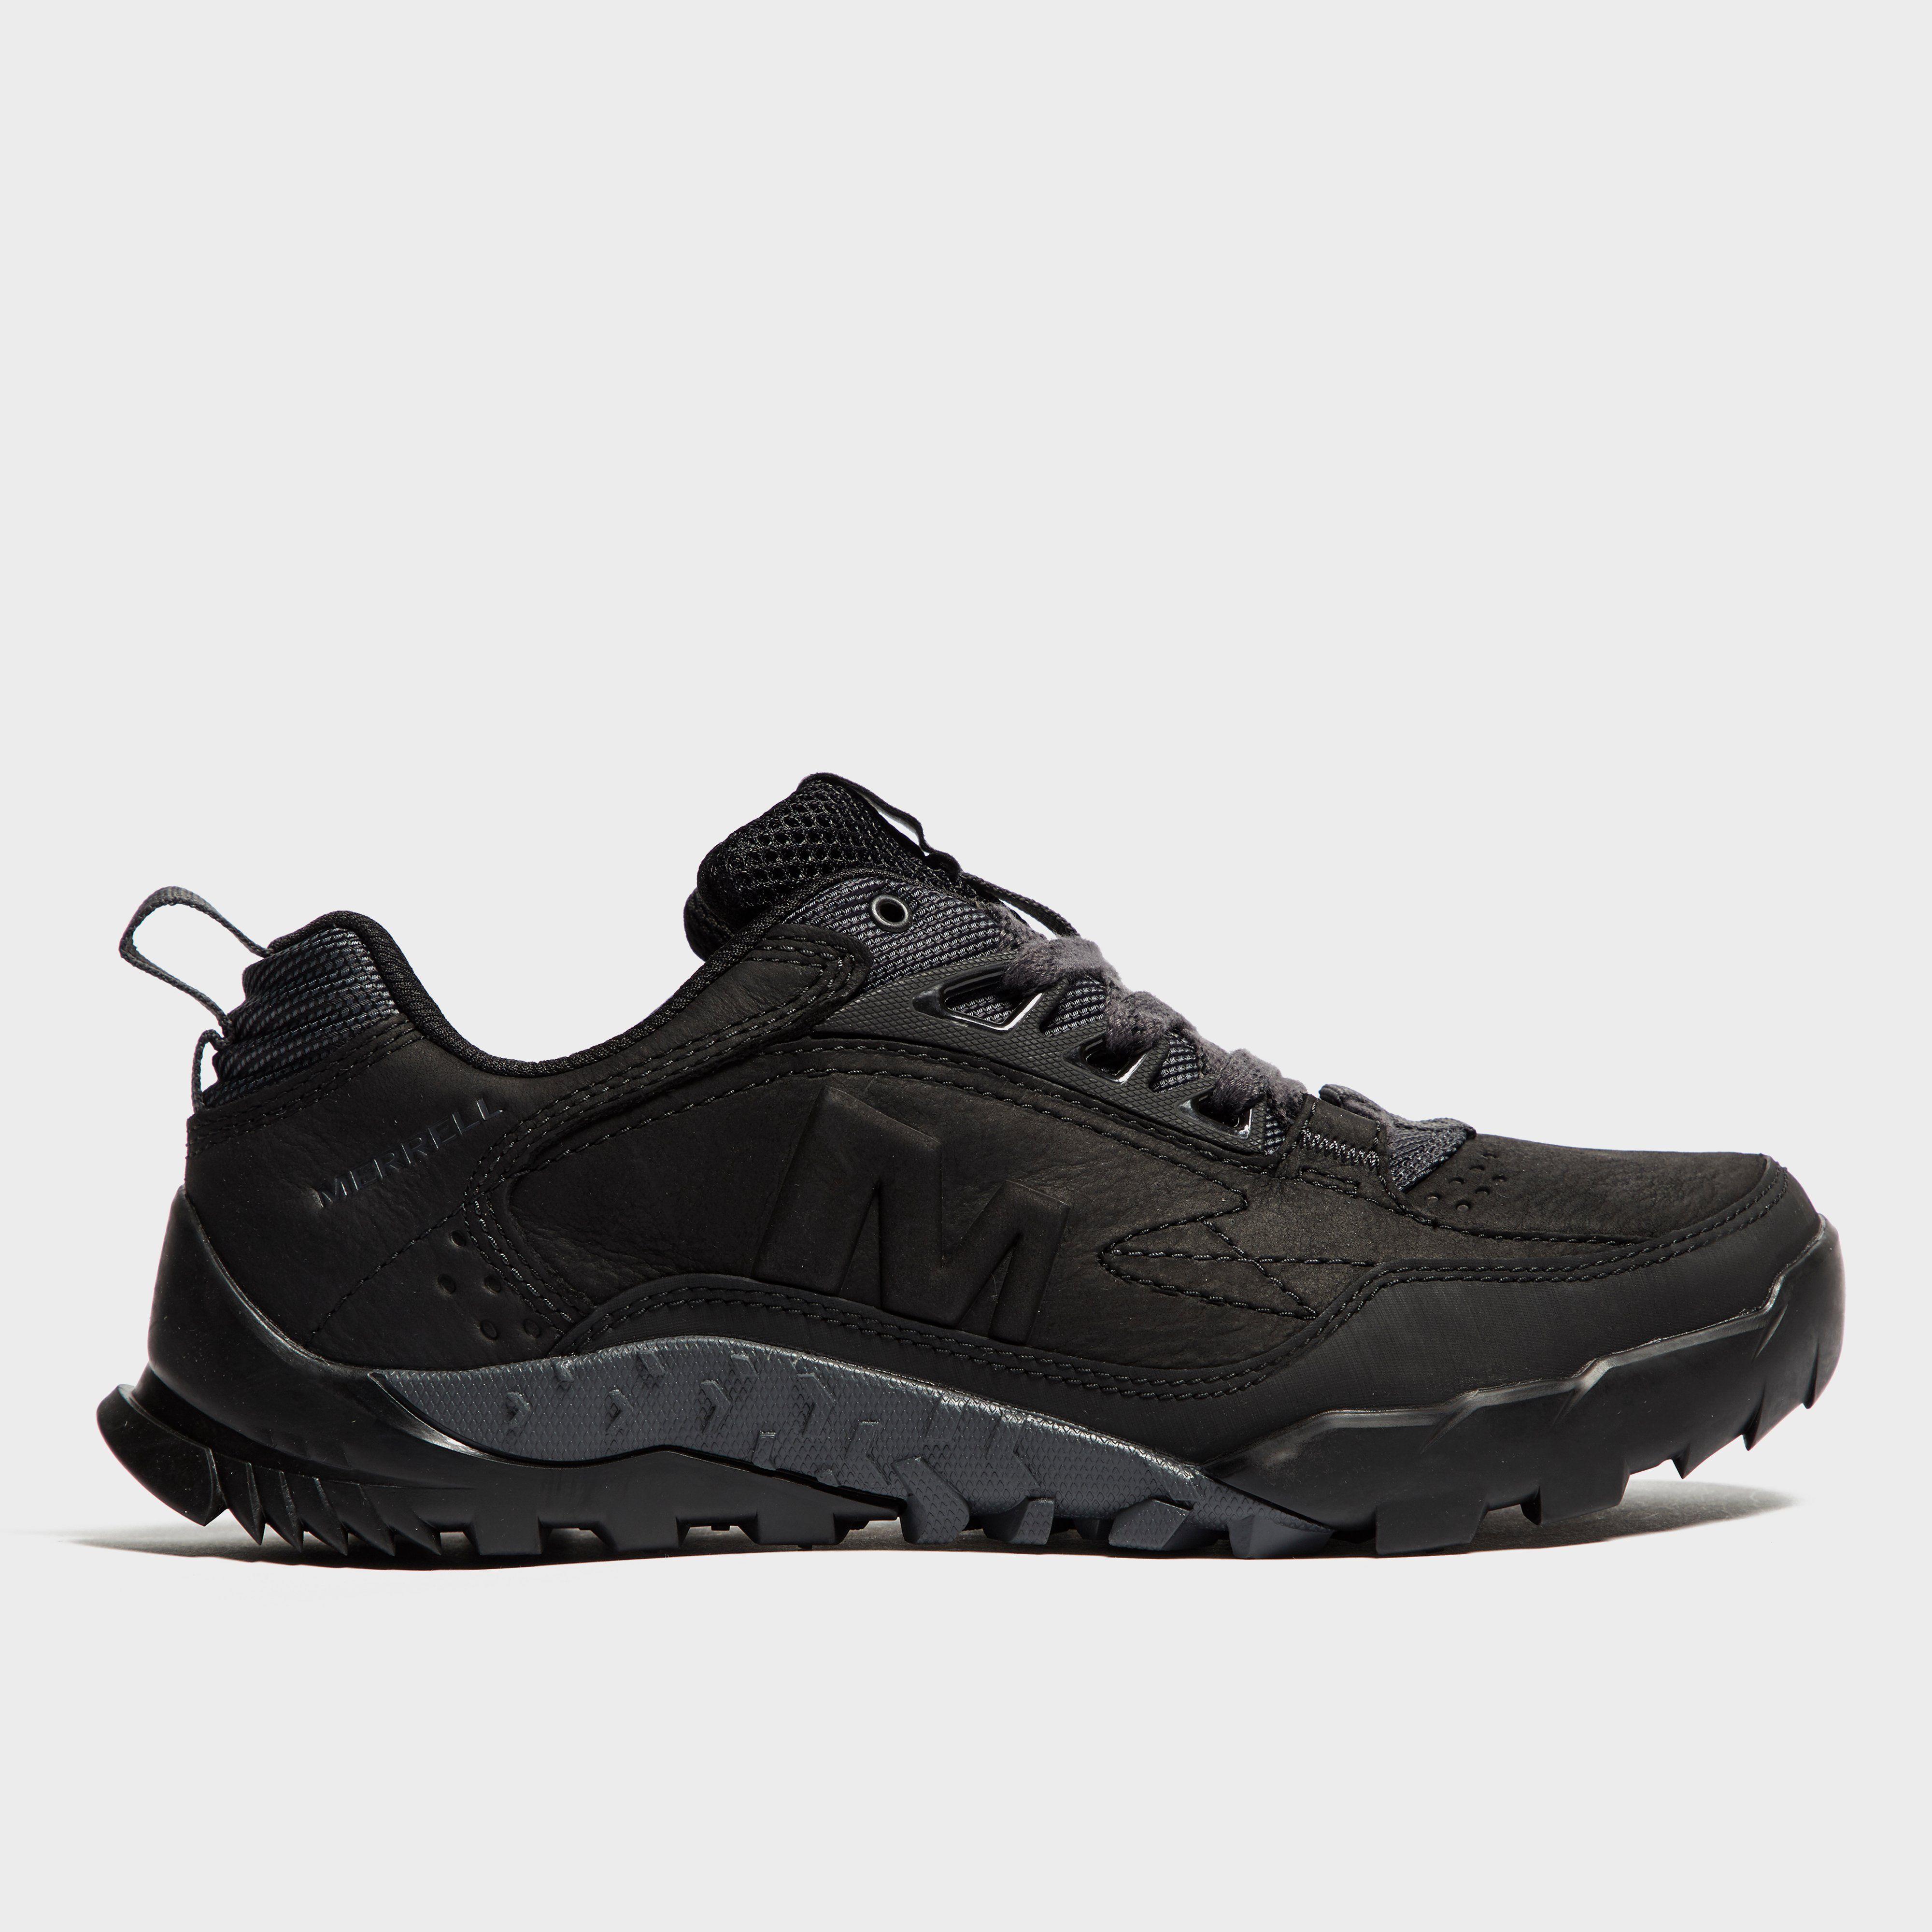 MERRELL Men's Annex Trak Shoes